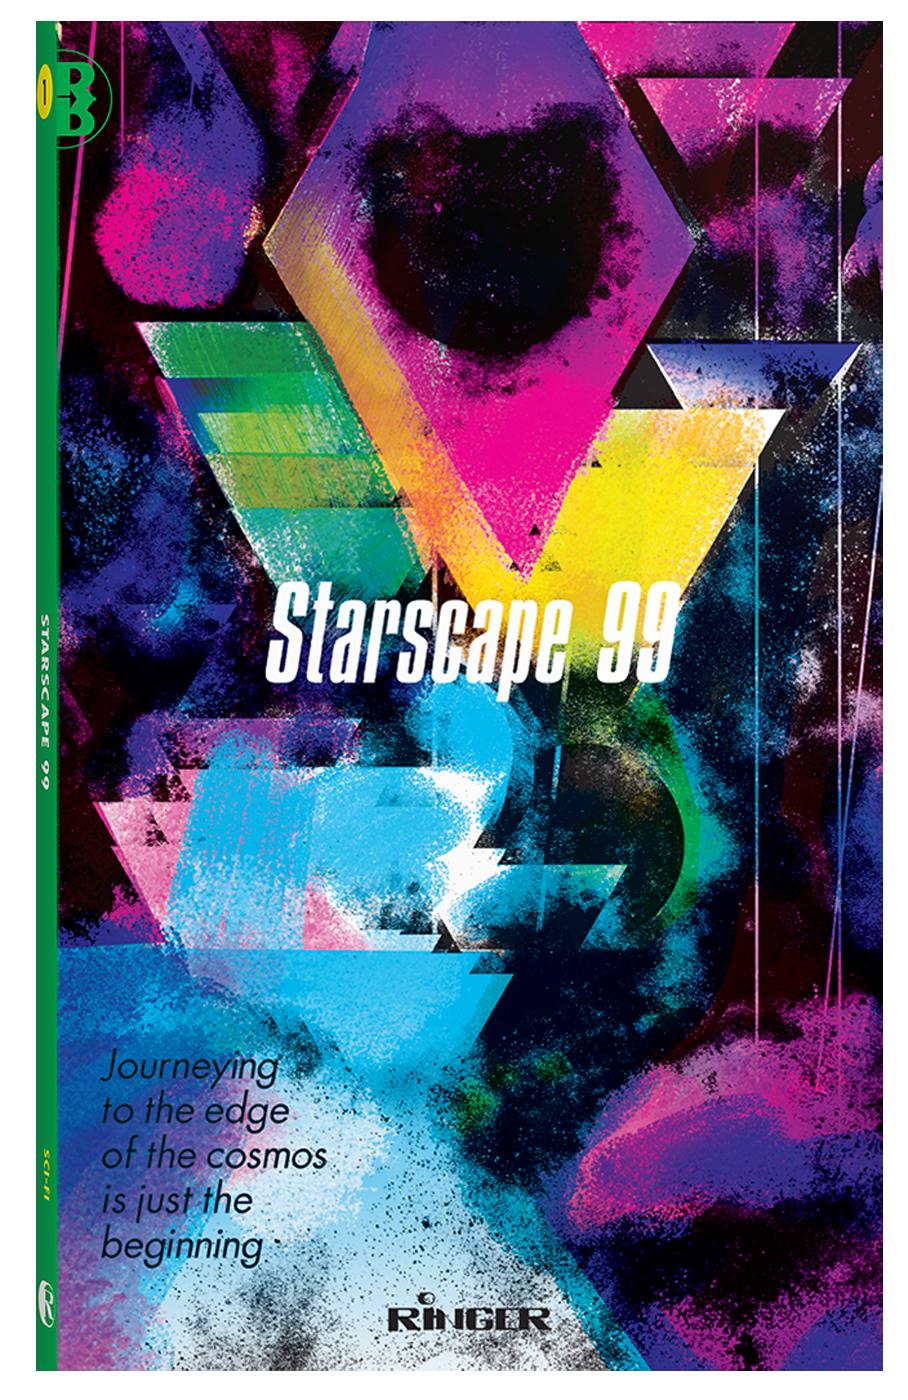 Starscape 99 - Book Packaging - Ringer Publishing